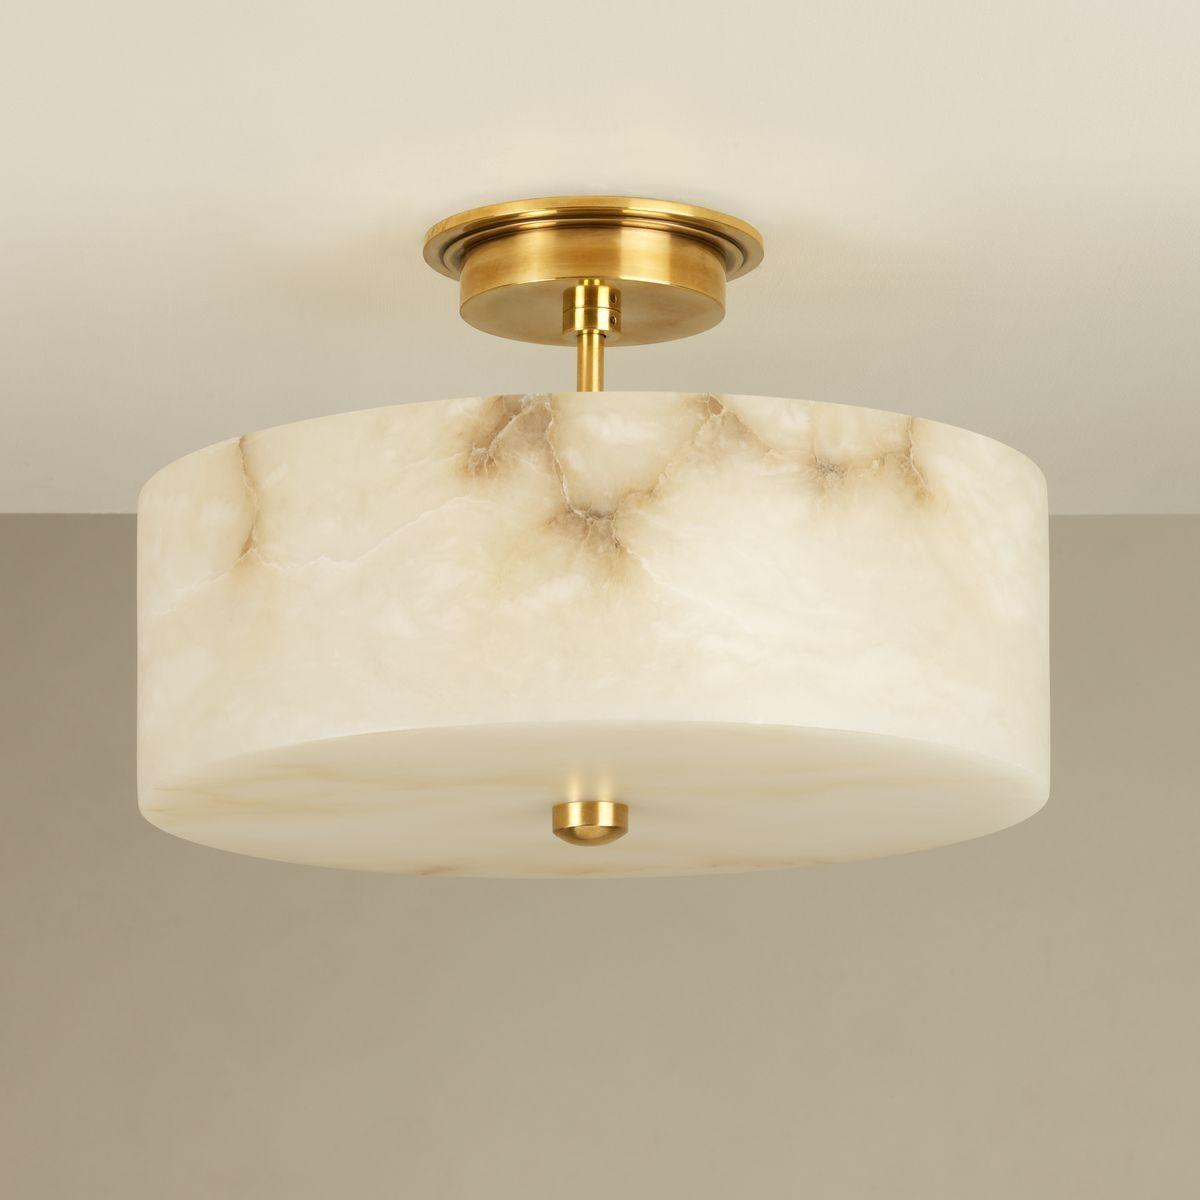 Buy Weston Alabaster Semi Flush Light Brass By Vaughan Designer Lighting From Dering Ha Flush Lighting Semi Flush Ceiling Lights Light Fixtures Flush Mount